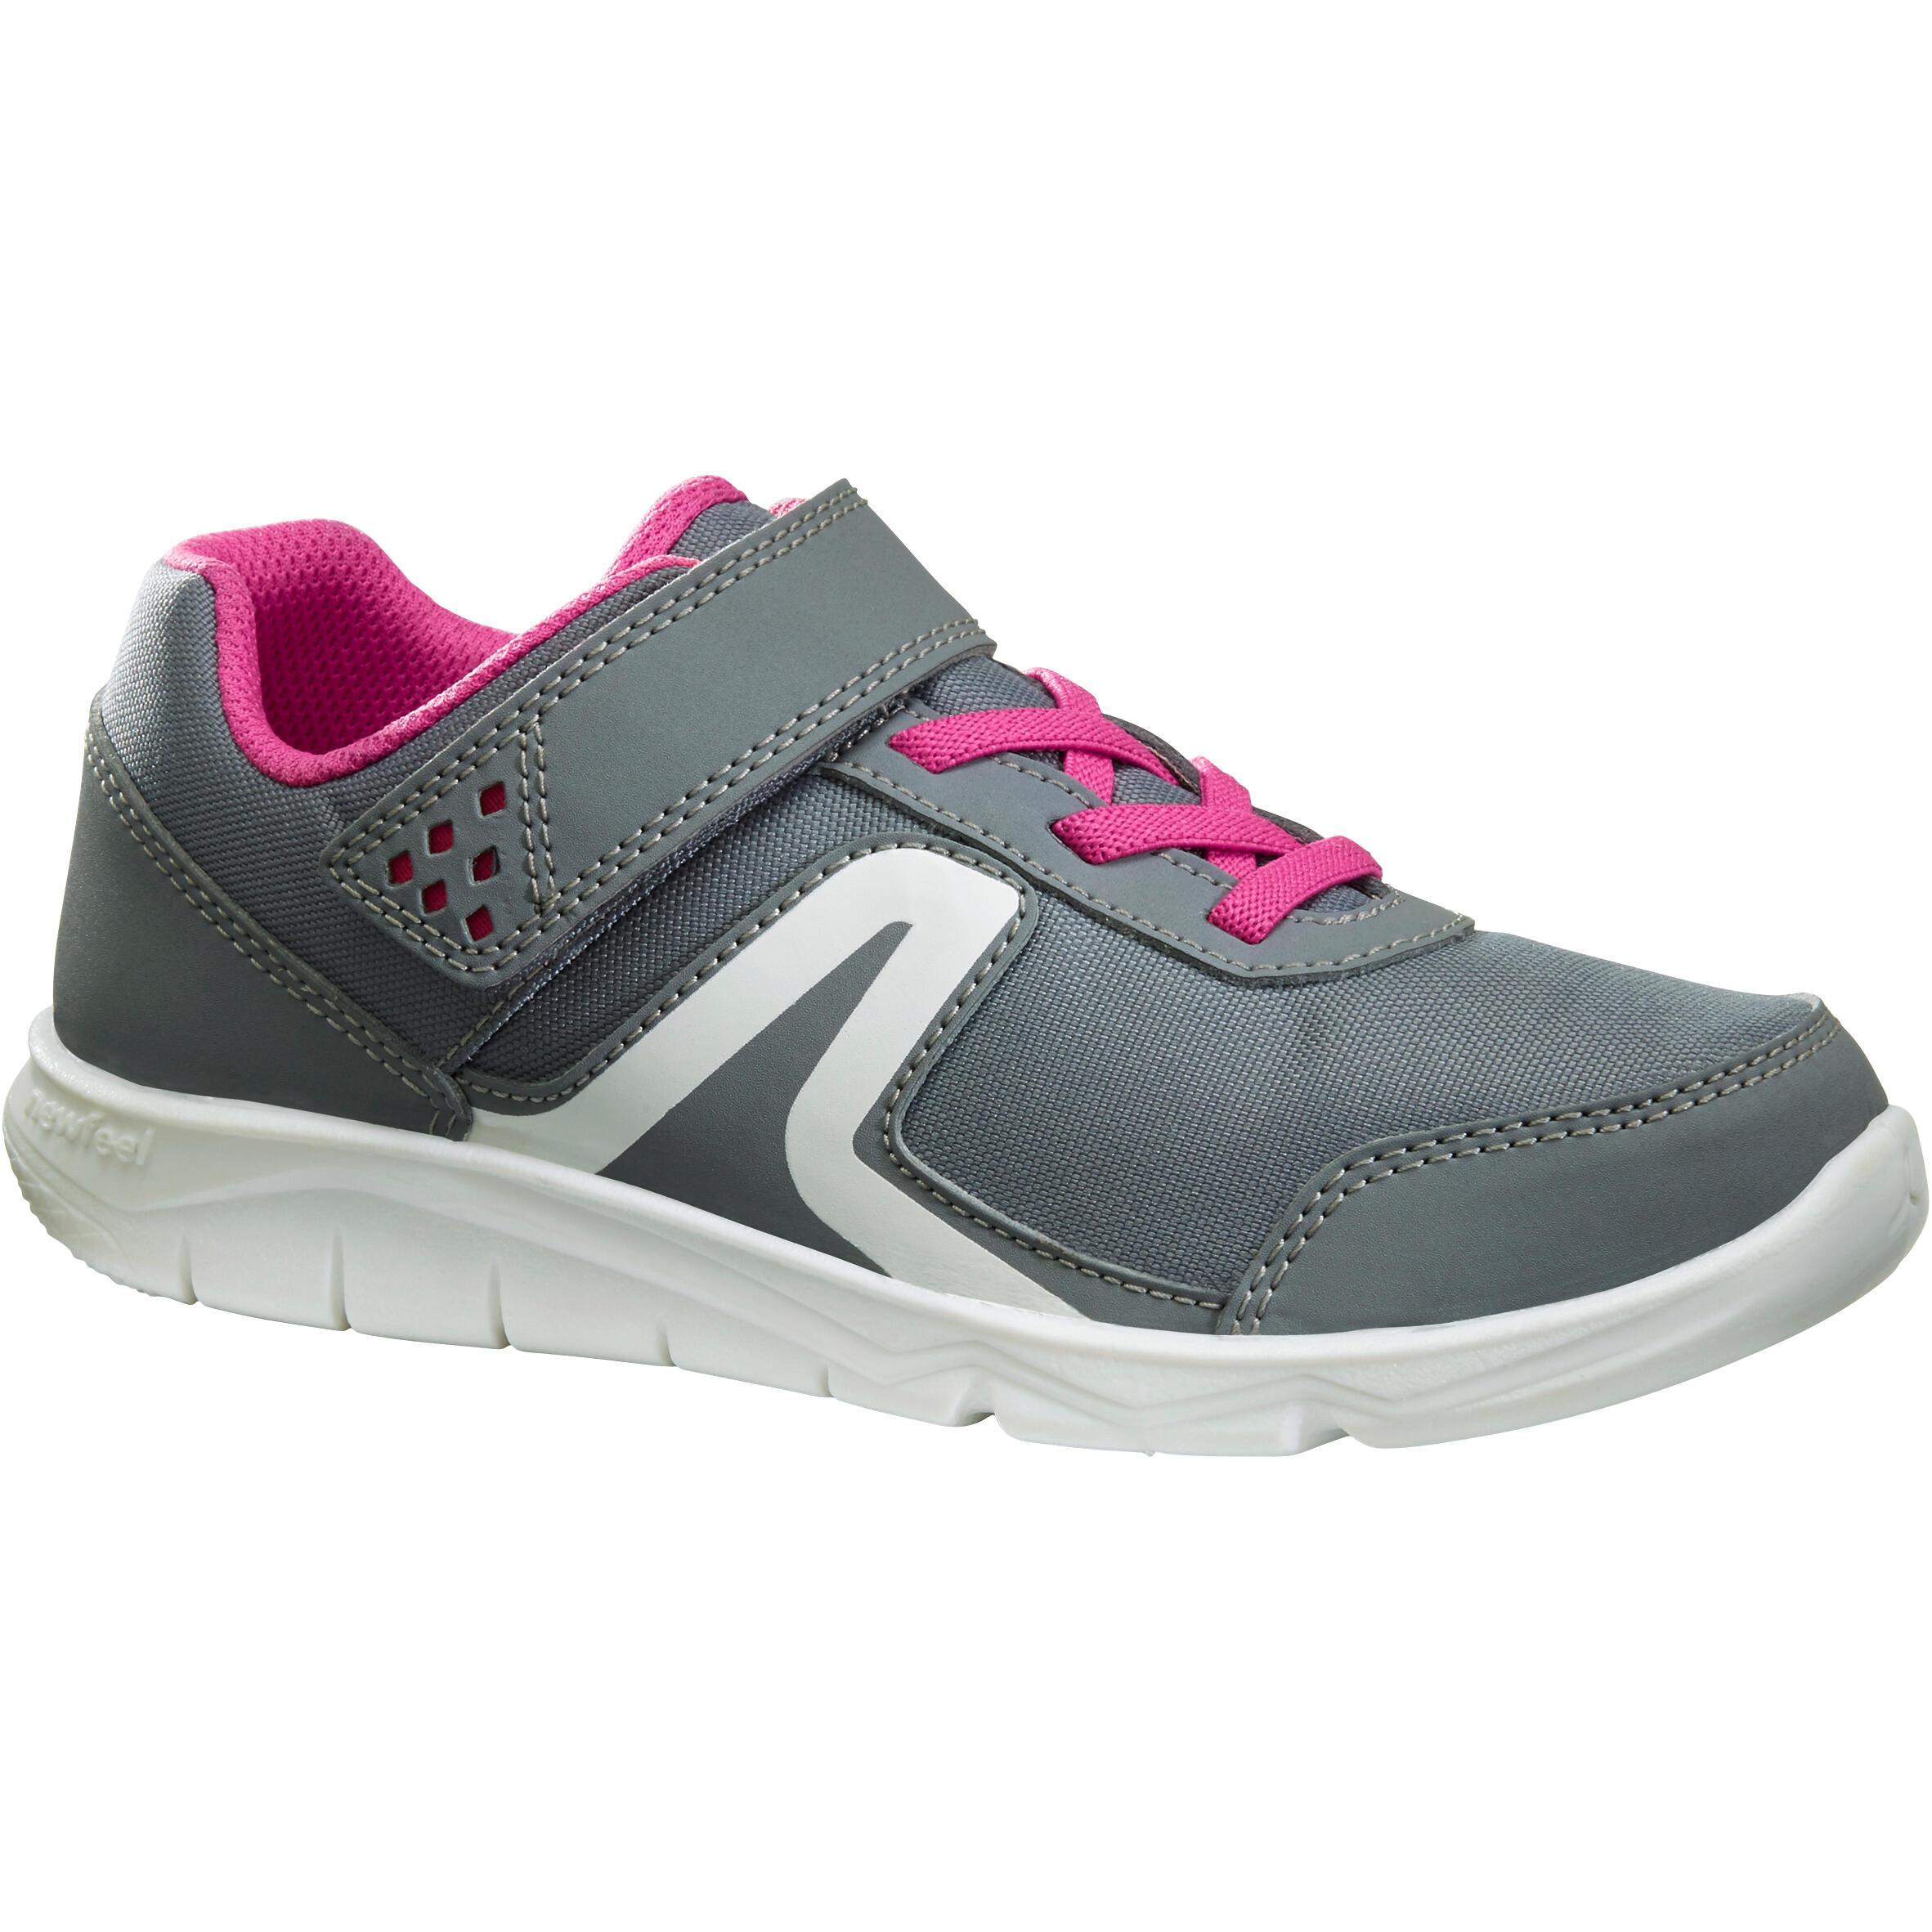 Newfeel chaussures marche sportive enfant pw 100 decathlon - Decathlon chaussures enfant ...